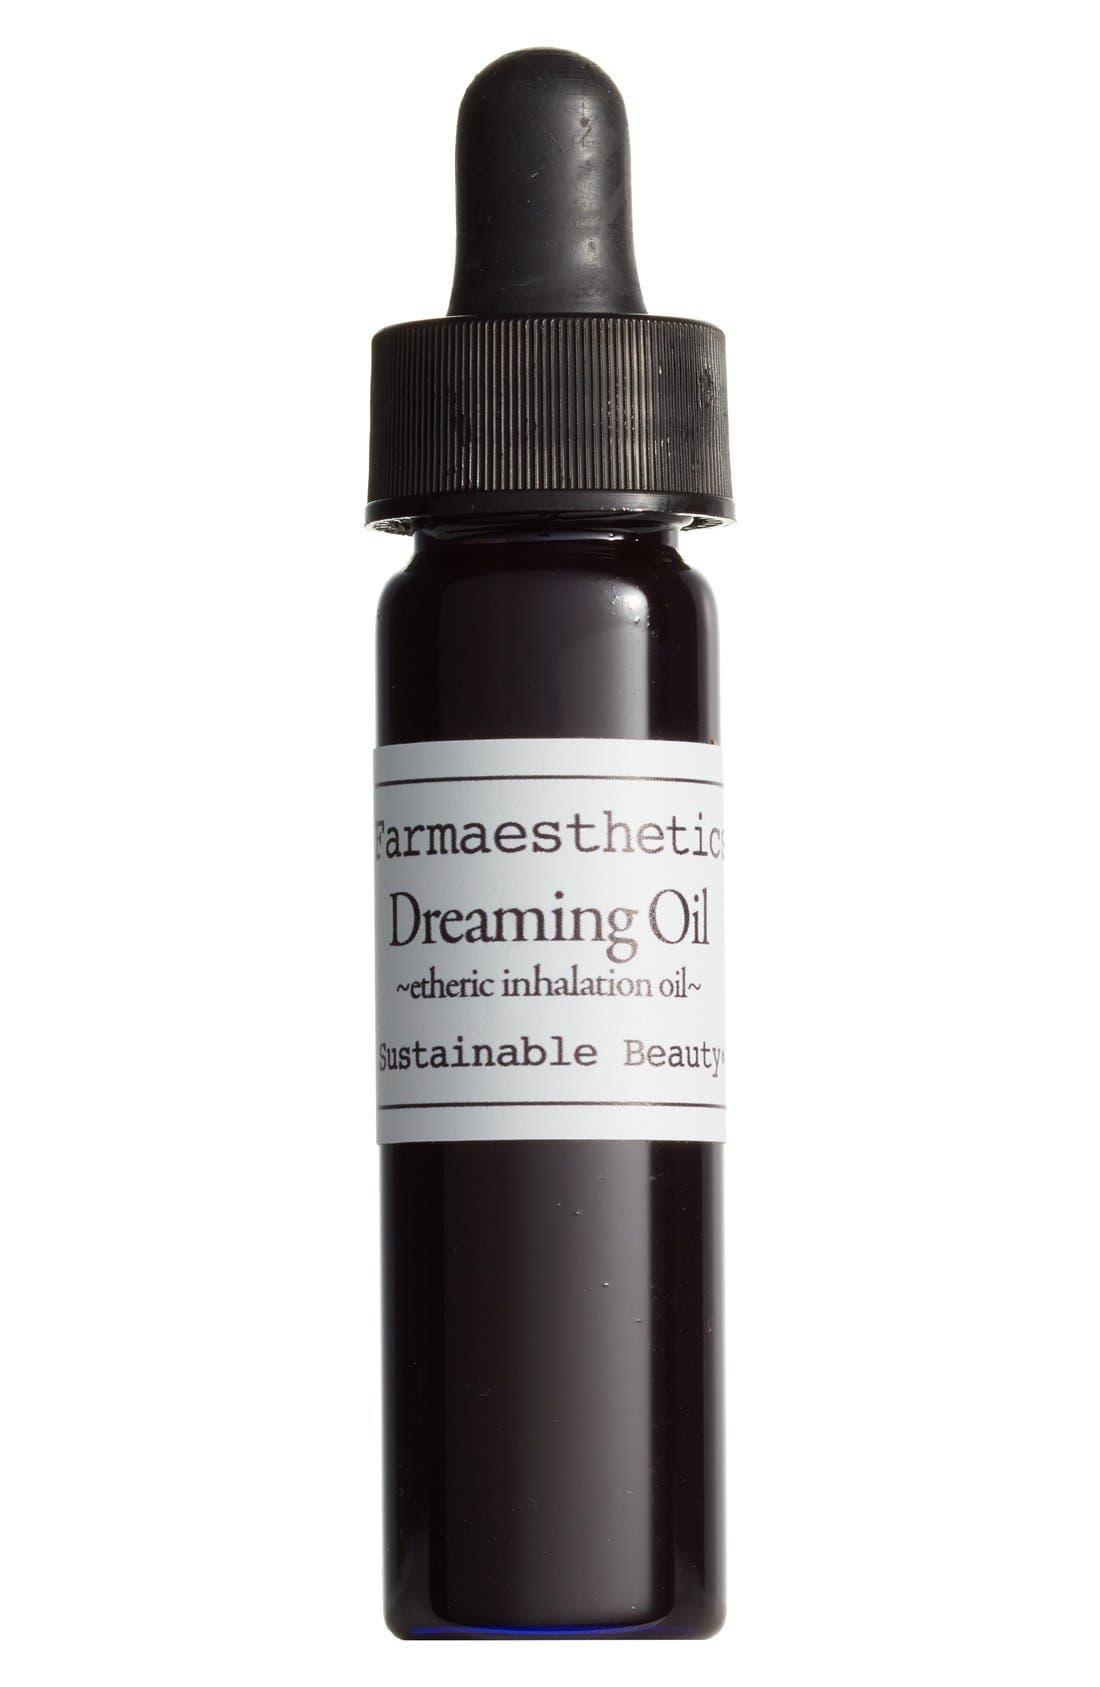 Farmaesthetics Dreaming Etheric Inhalation Oil